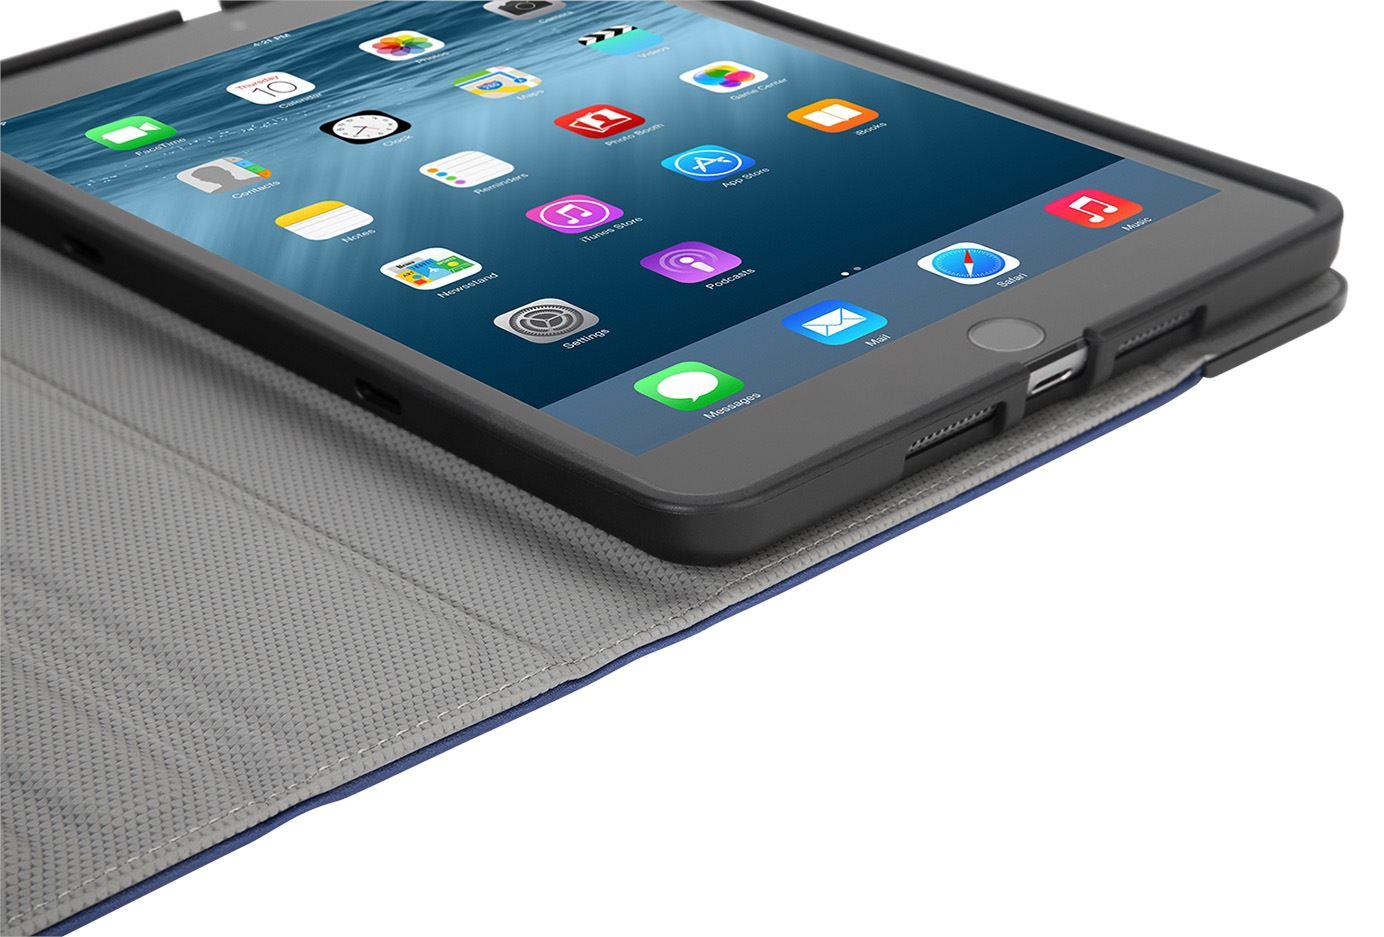 Versavu slim ipad mini 4321 rotating stand case blue thecheapjerseys Image collections